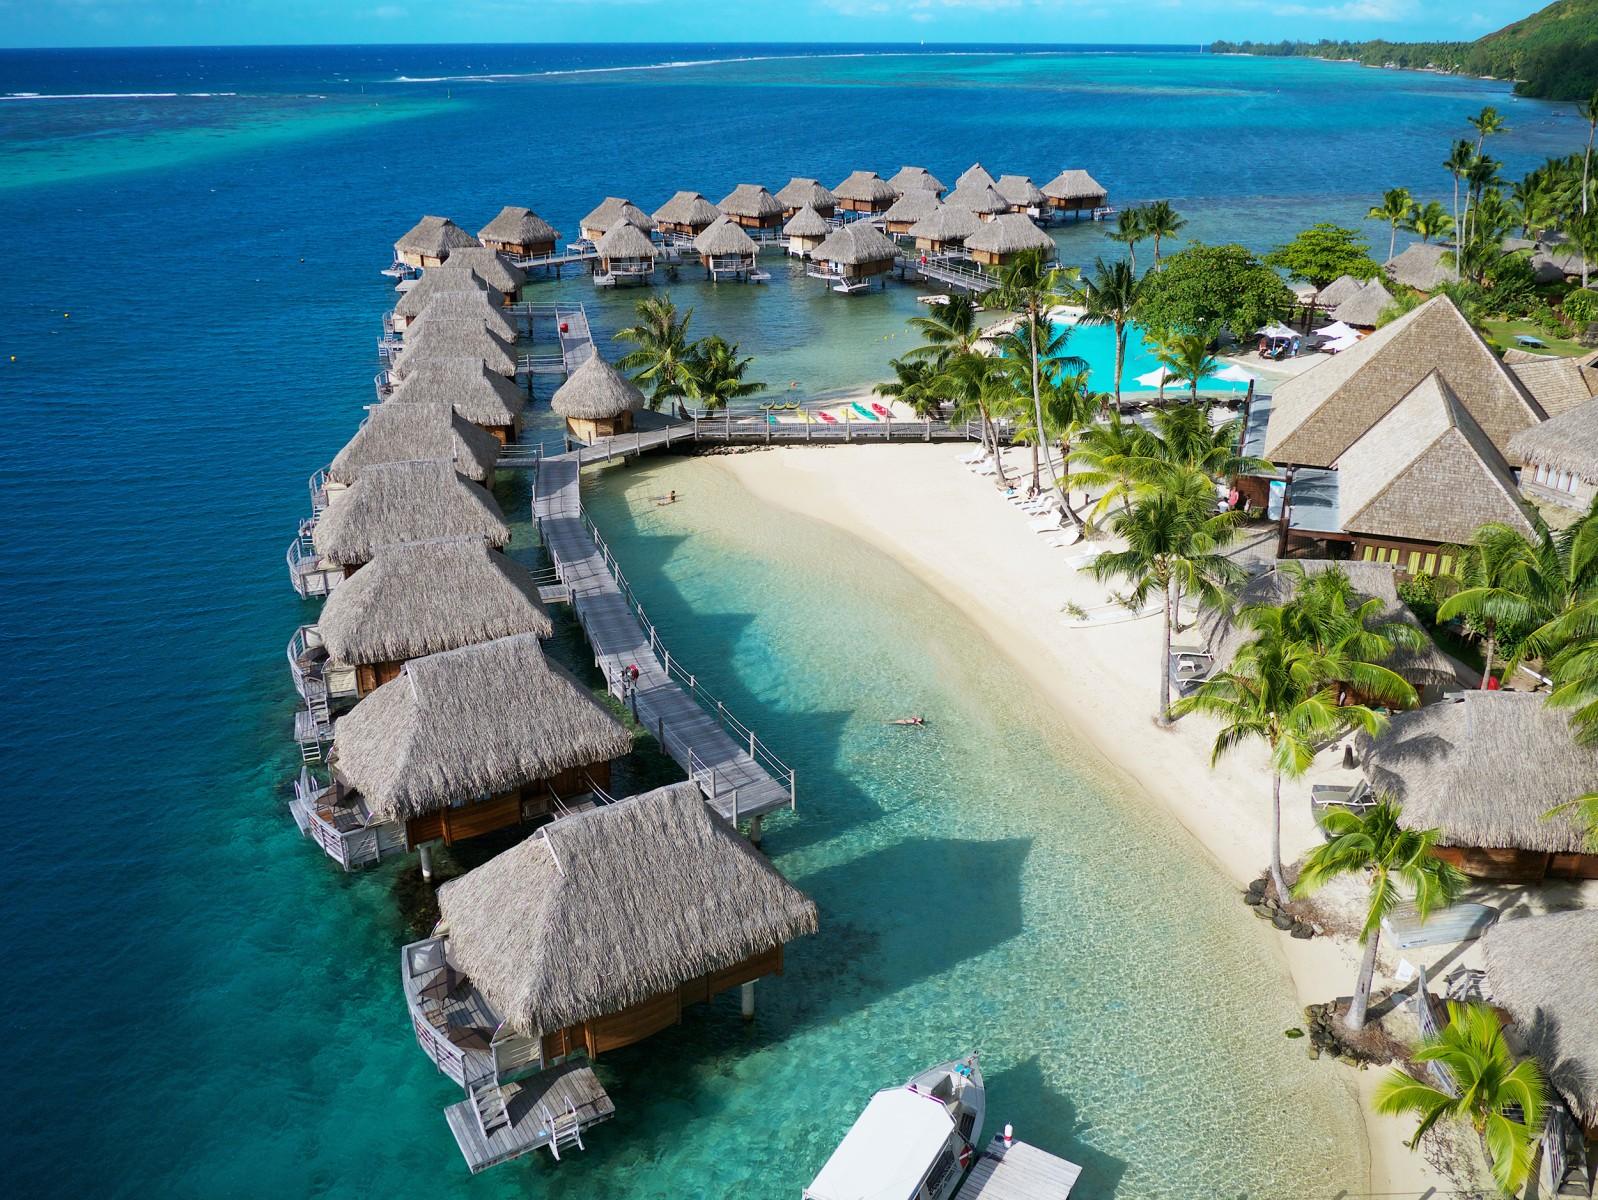 Location Manava Beach Resort Spa Hotel Moorea